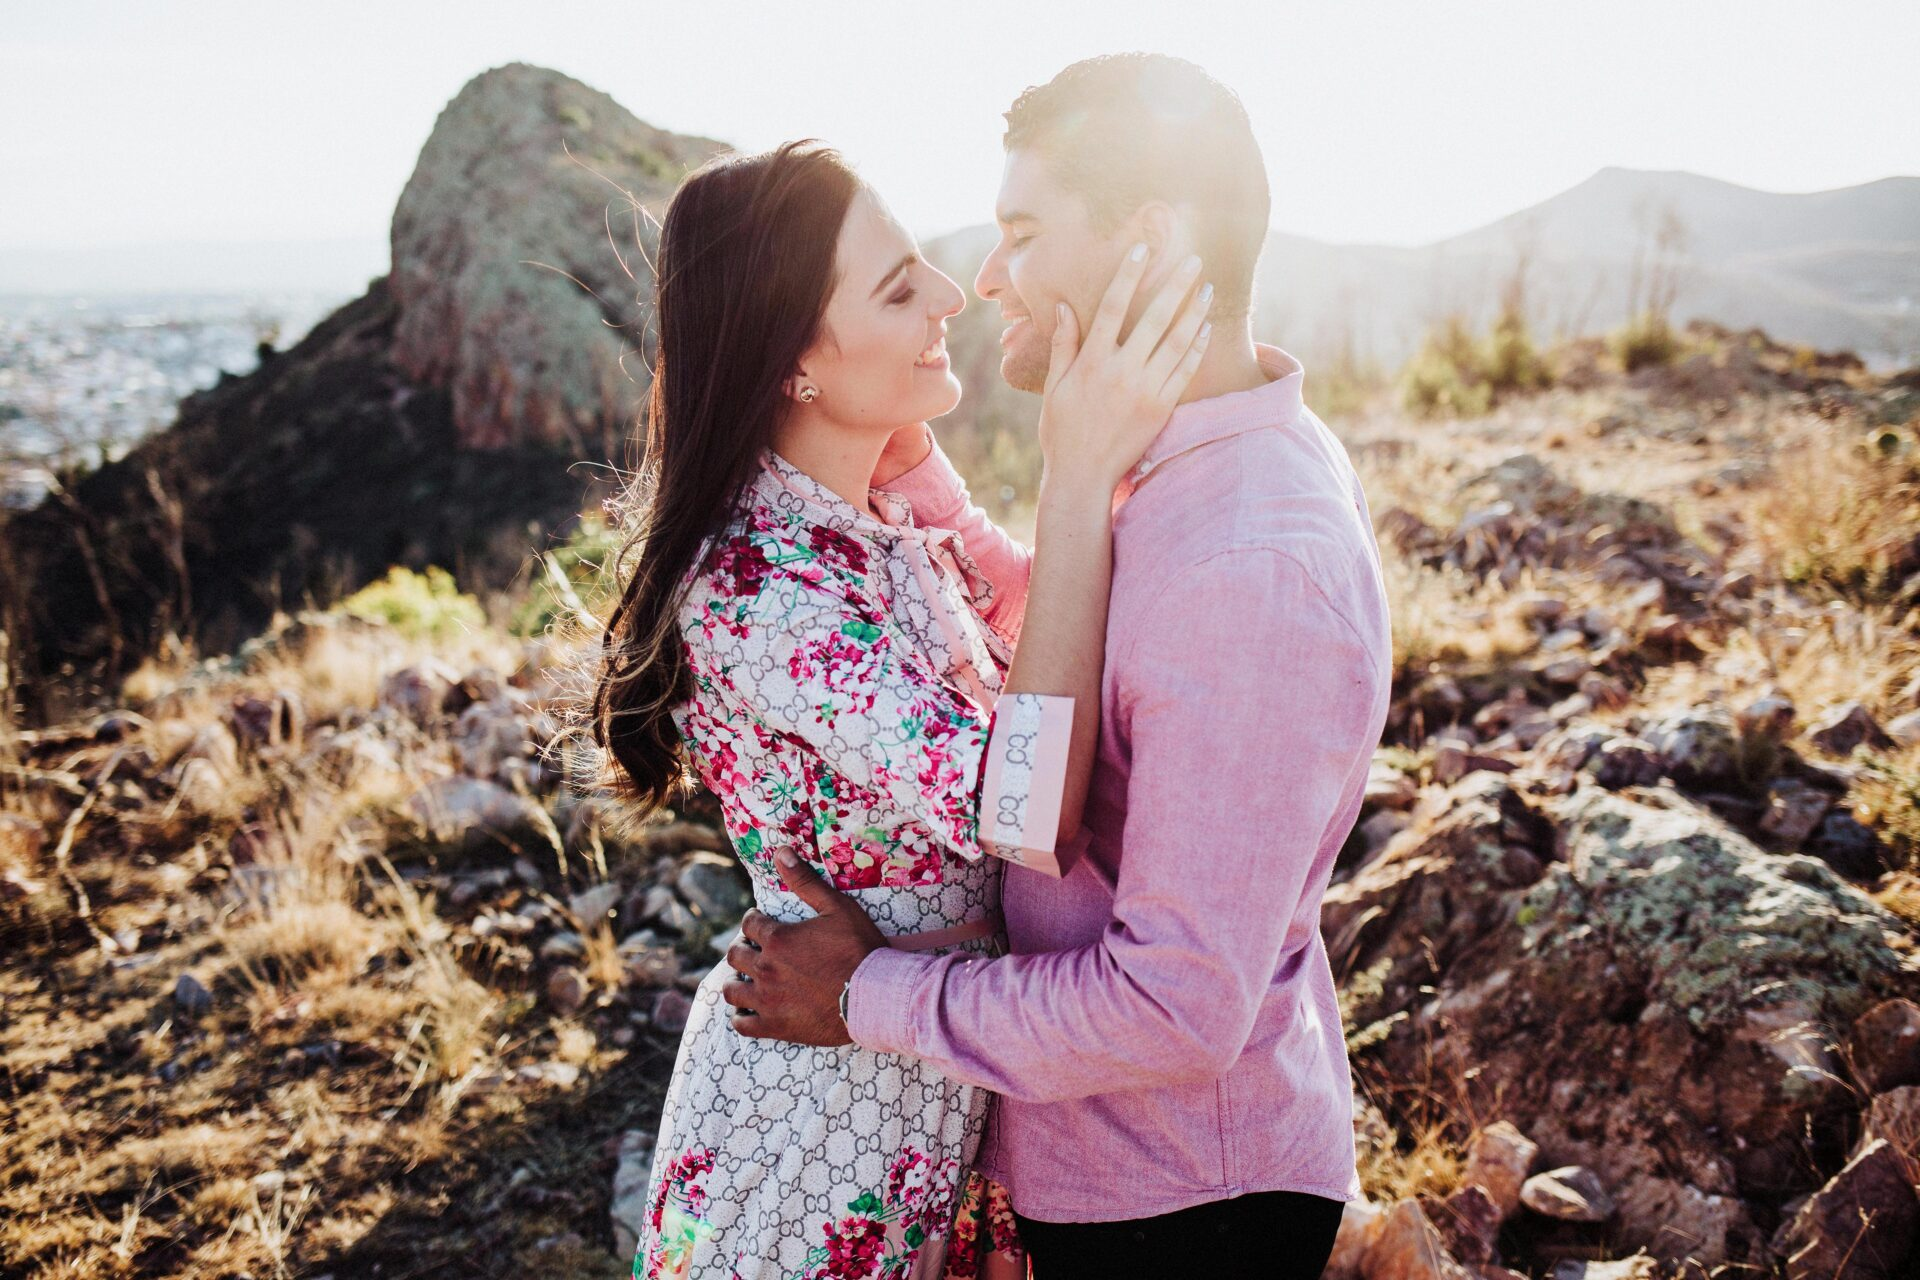 javier_noriega_fotografo_bodas_save_the_date_preboda_zacatecas_wedding_photographer11